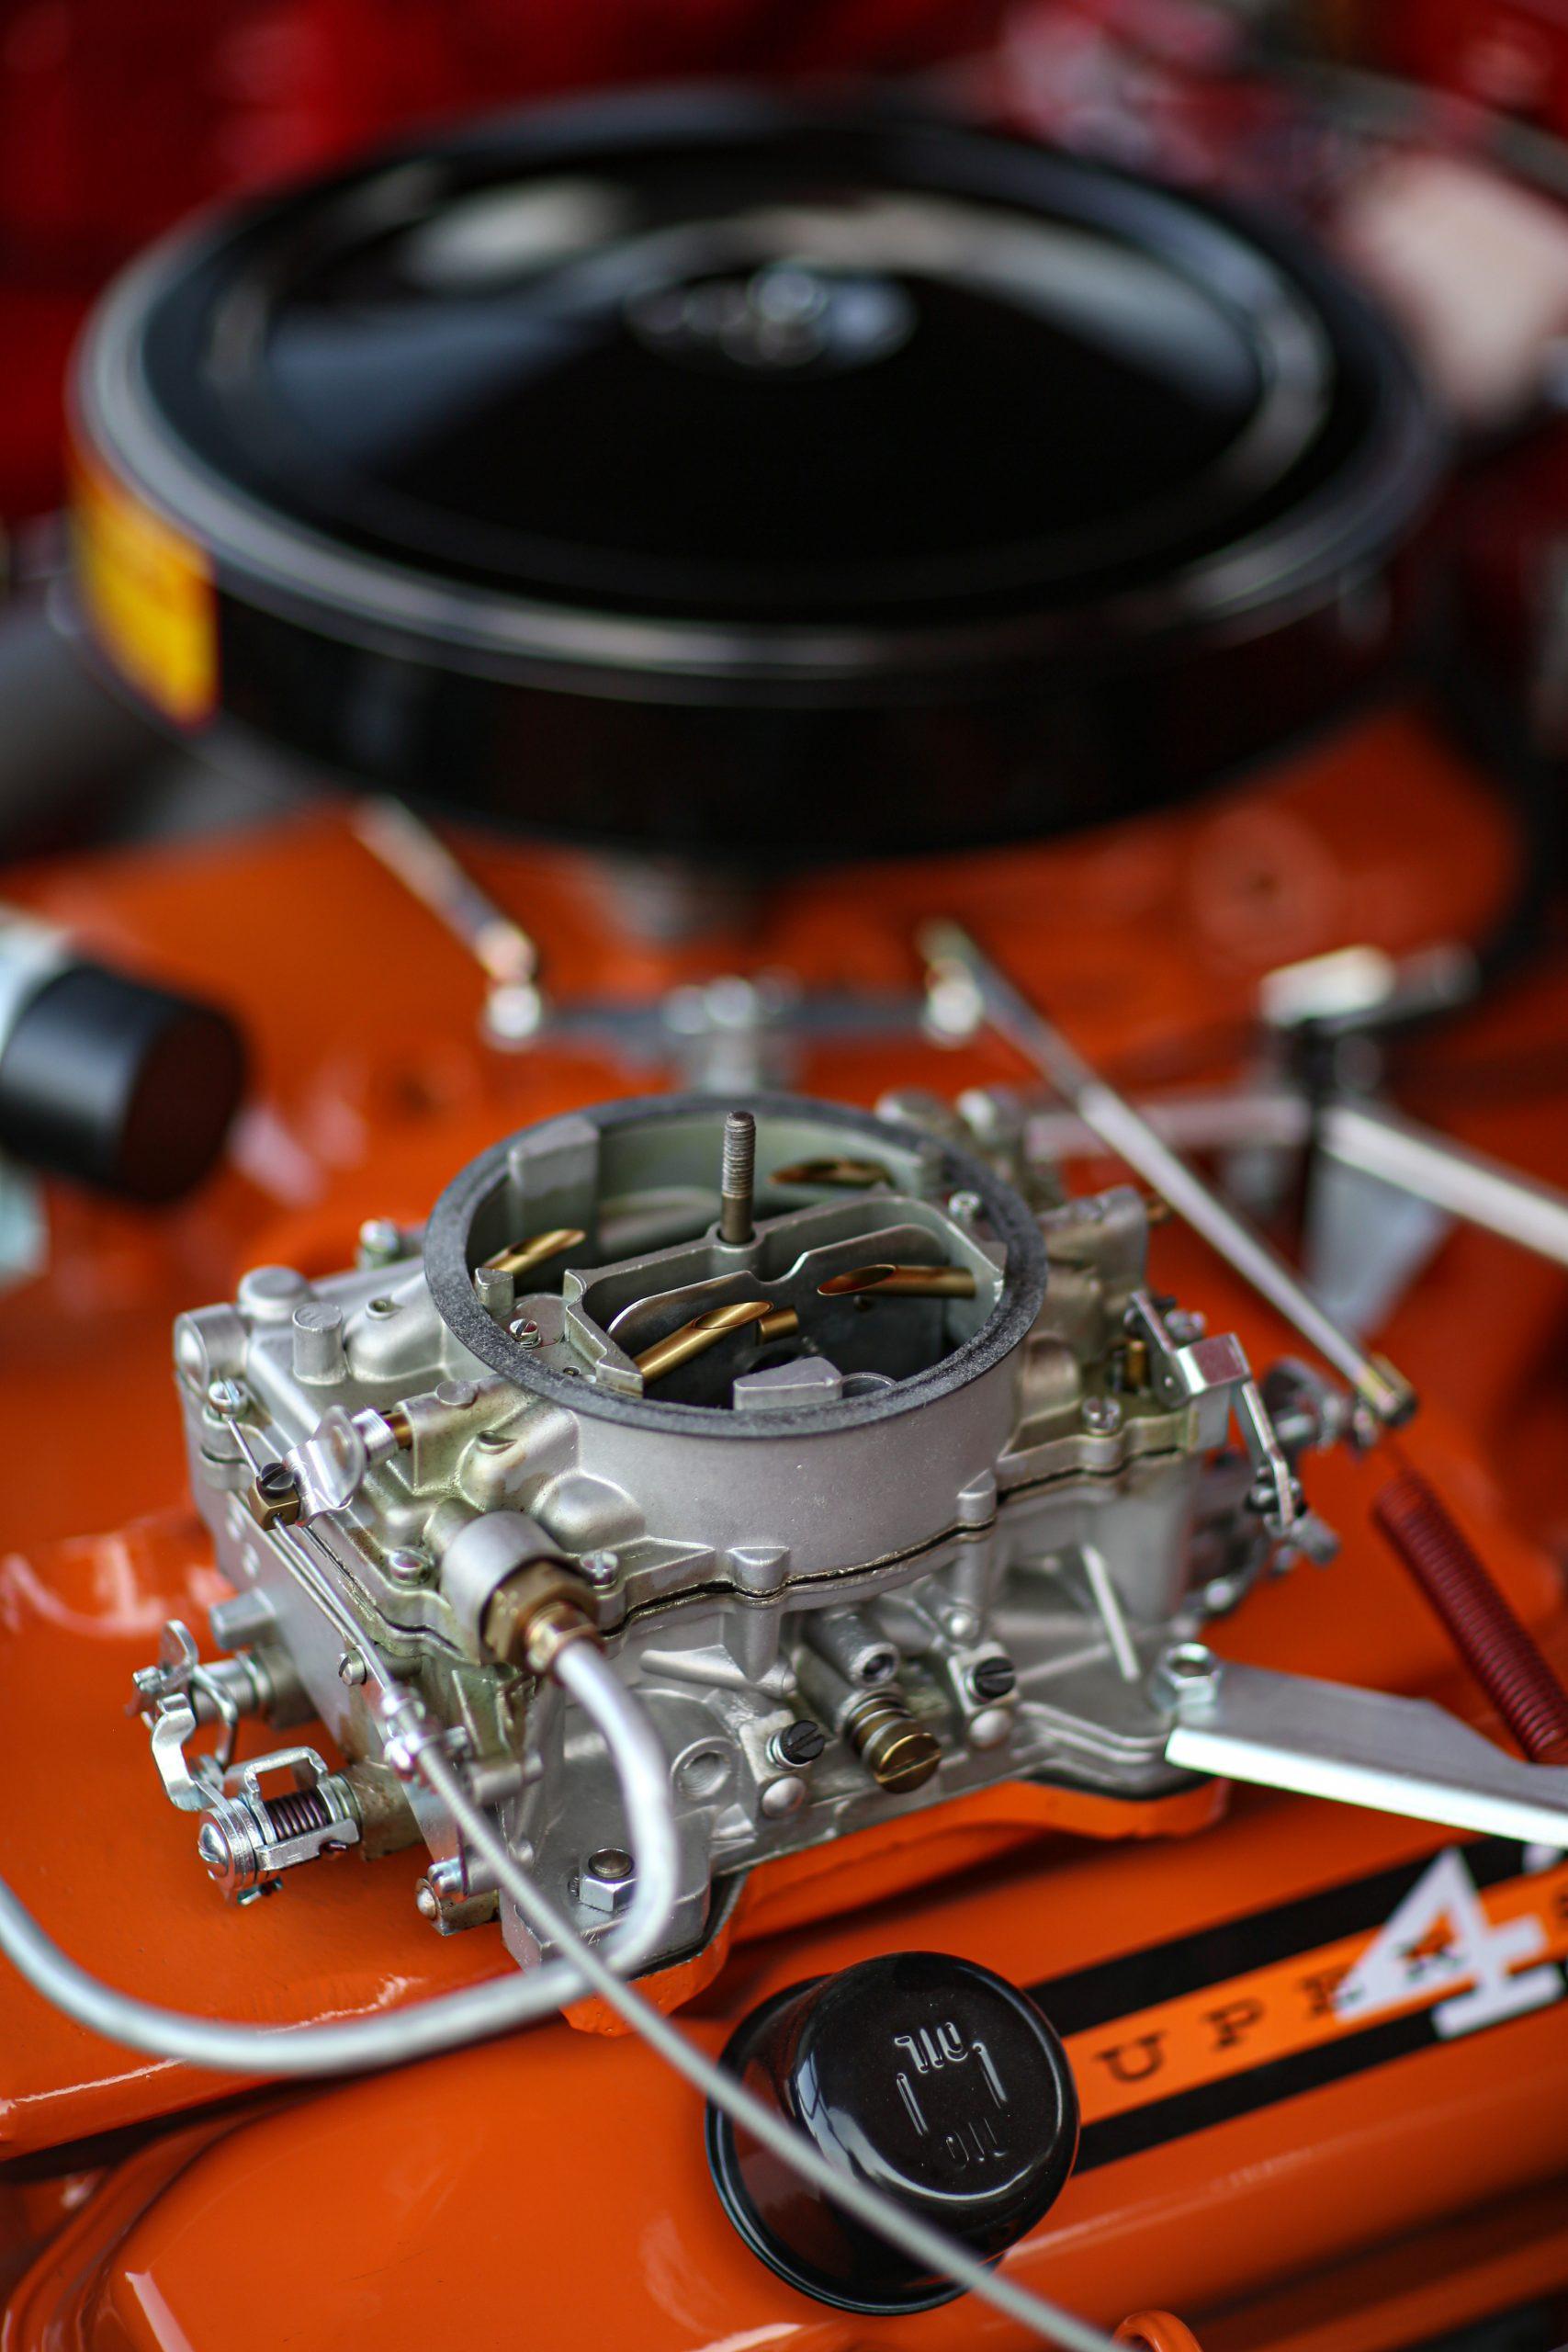 1963 Plymouth 426 Max Wedge lightweight carburetor